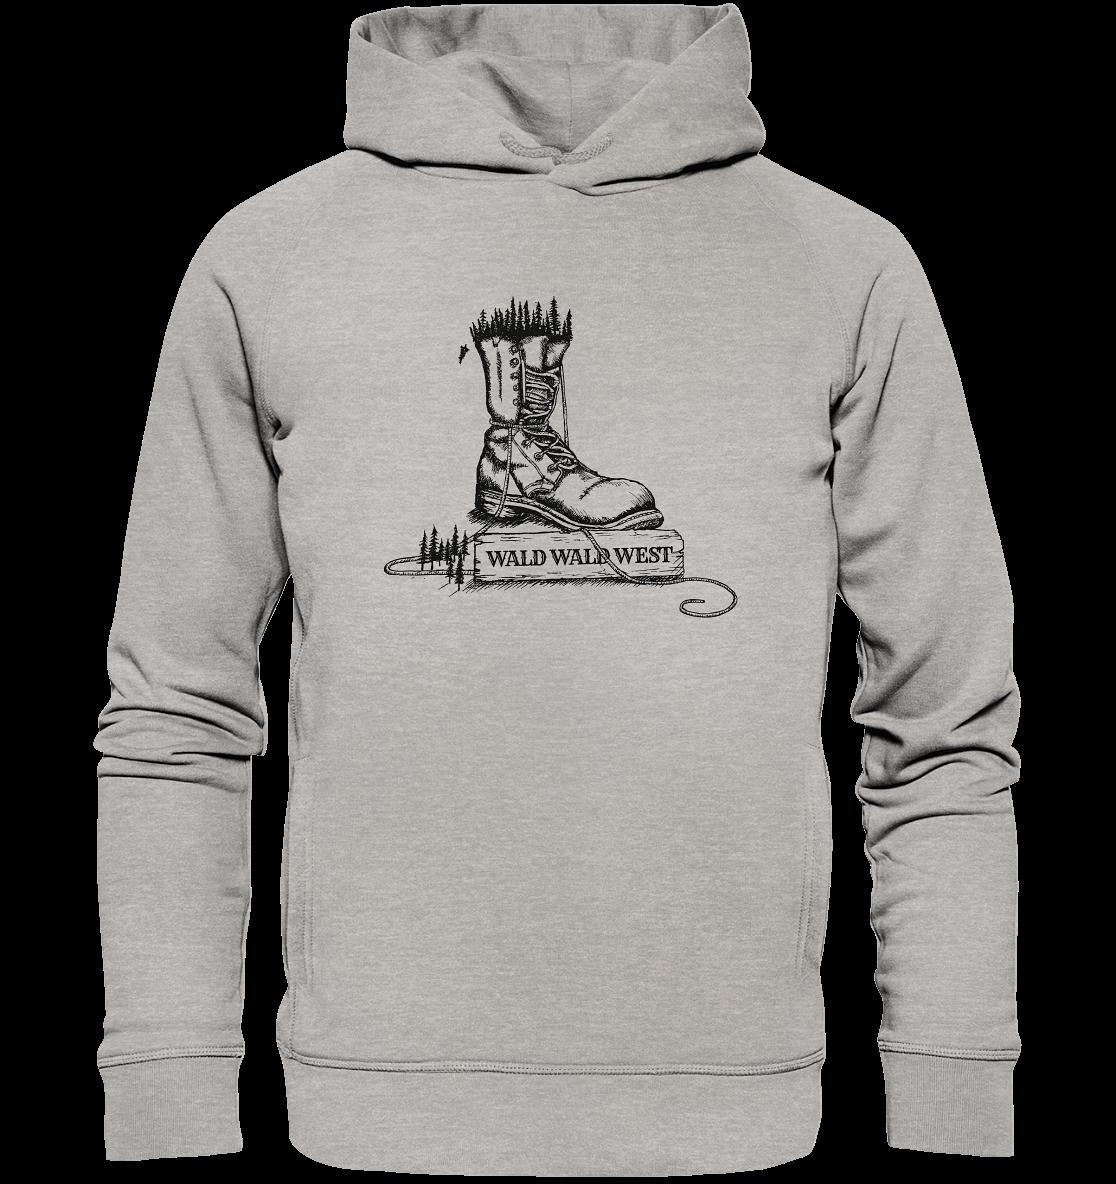 front-organic-fashion-hoodie-c2c1c0-1116x-1.png